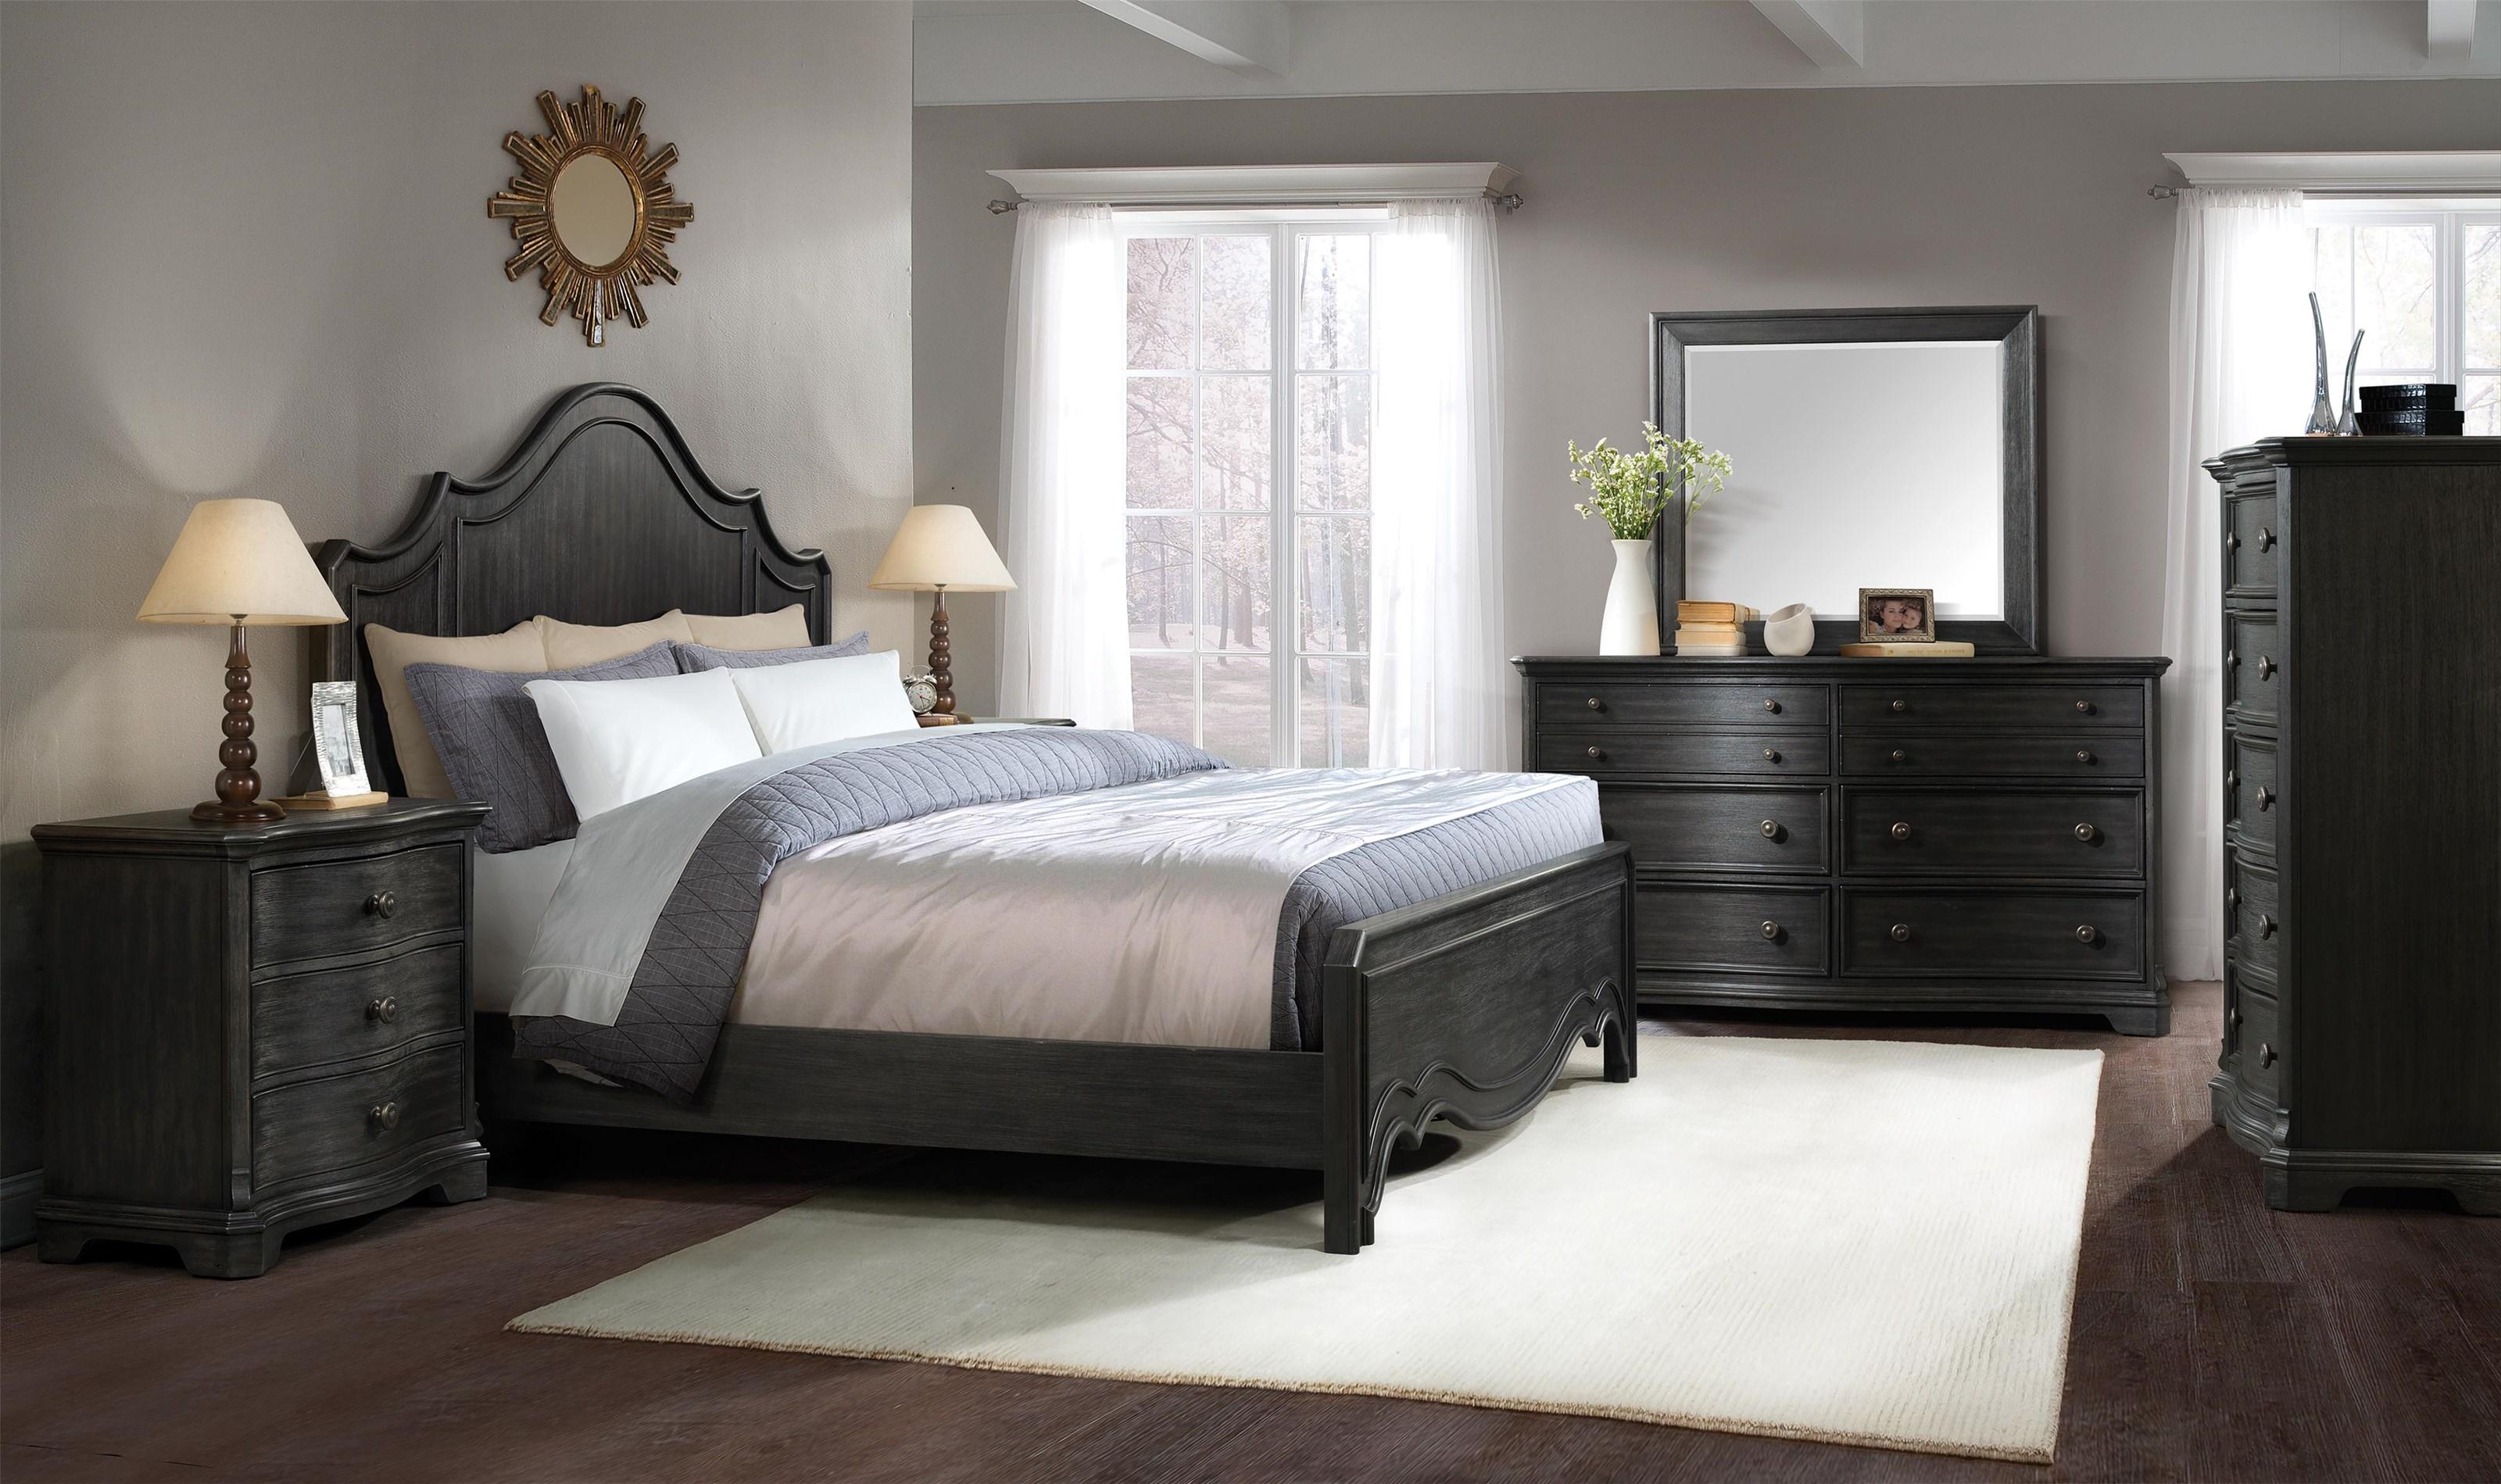 Riverside Furniture 217 Memorial King Panel Bed - Item Number: RIV217KKIT